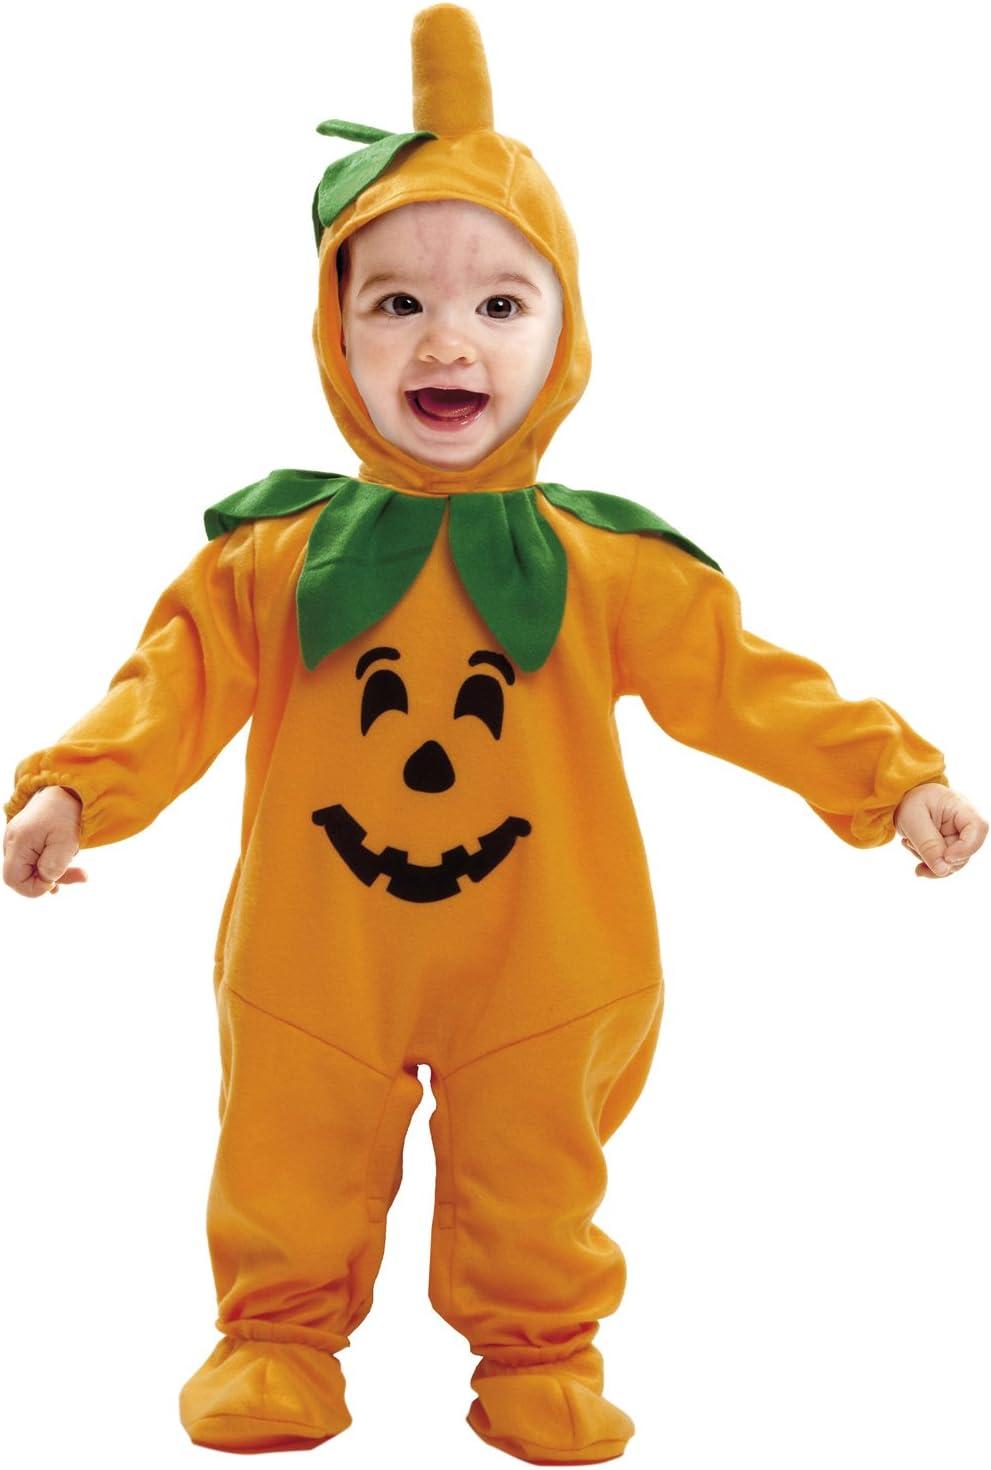 My Other Me Me-201841 Disfraz de bebé calabaza, 7-12 meses (Viving Costumes 201841)